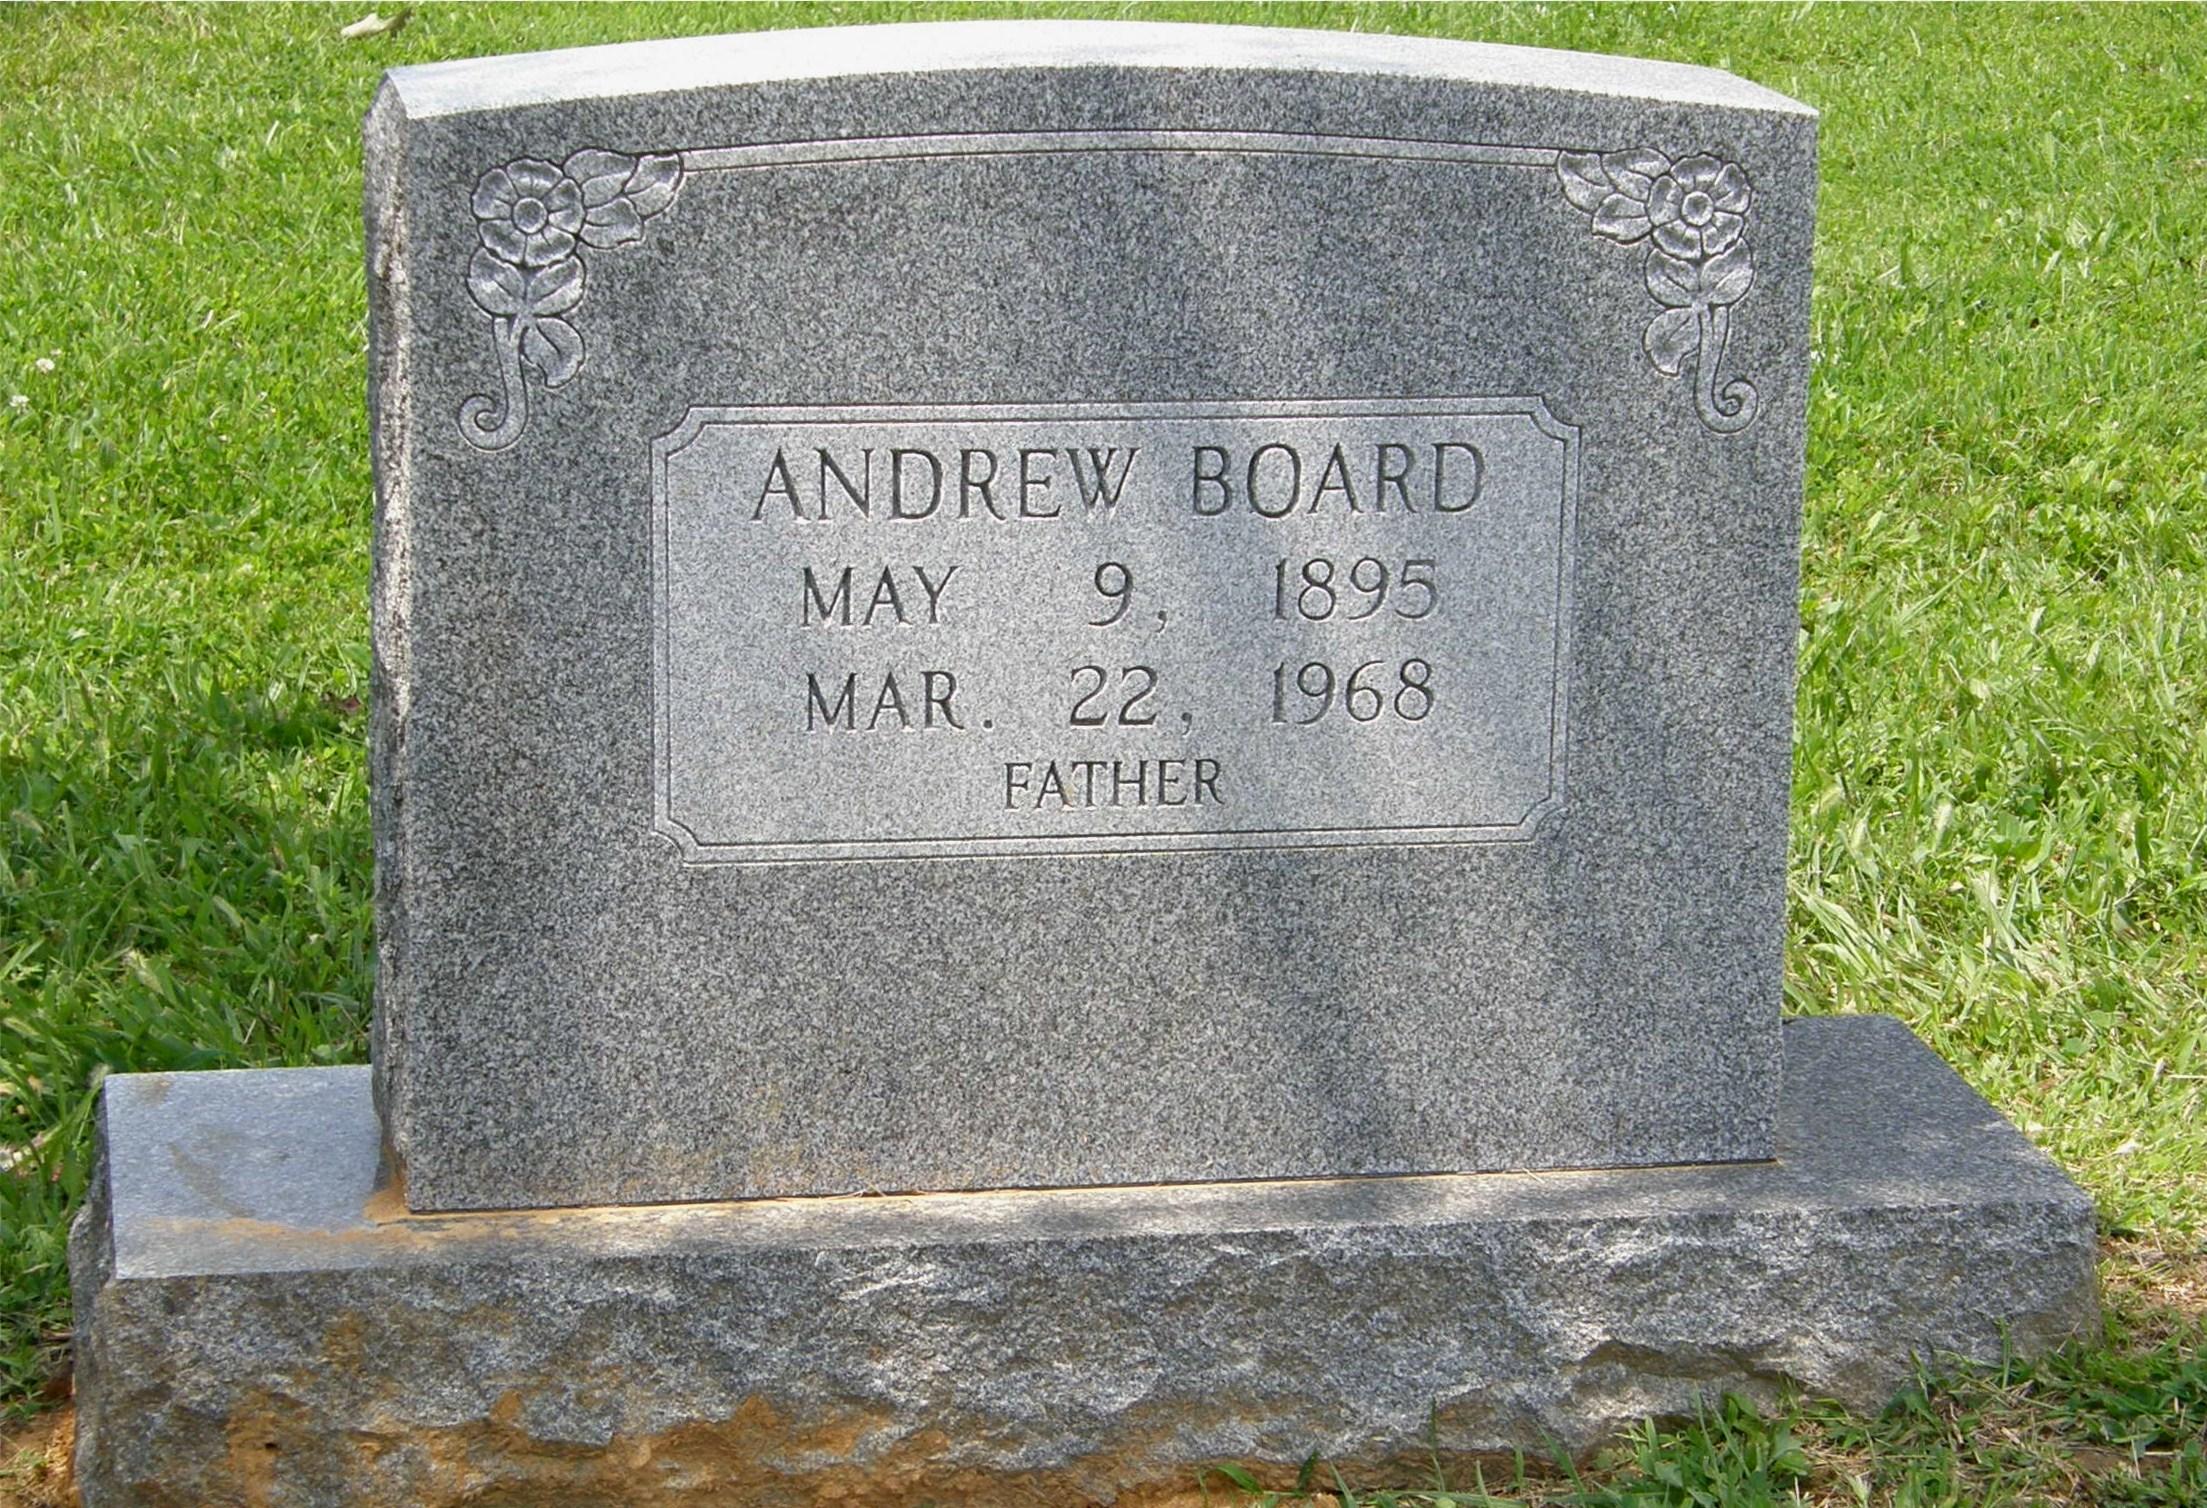 Andrew Board